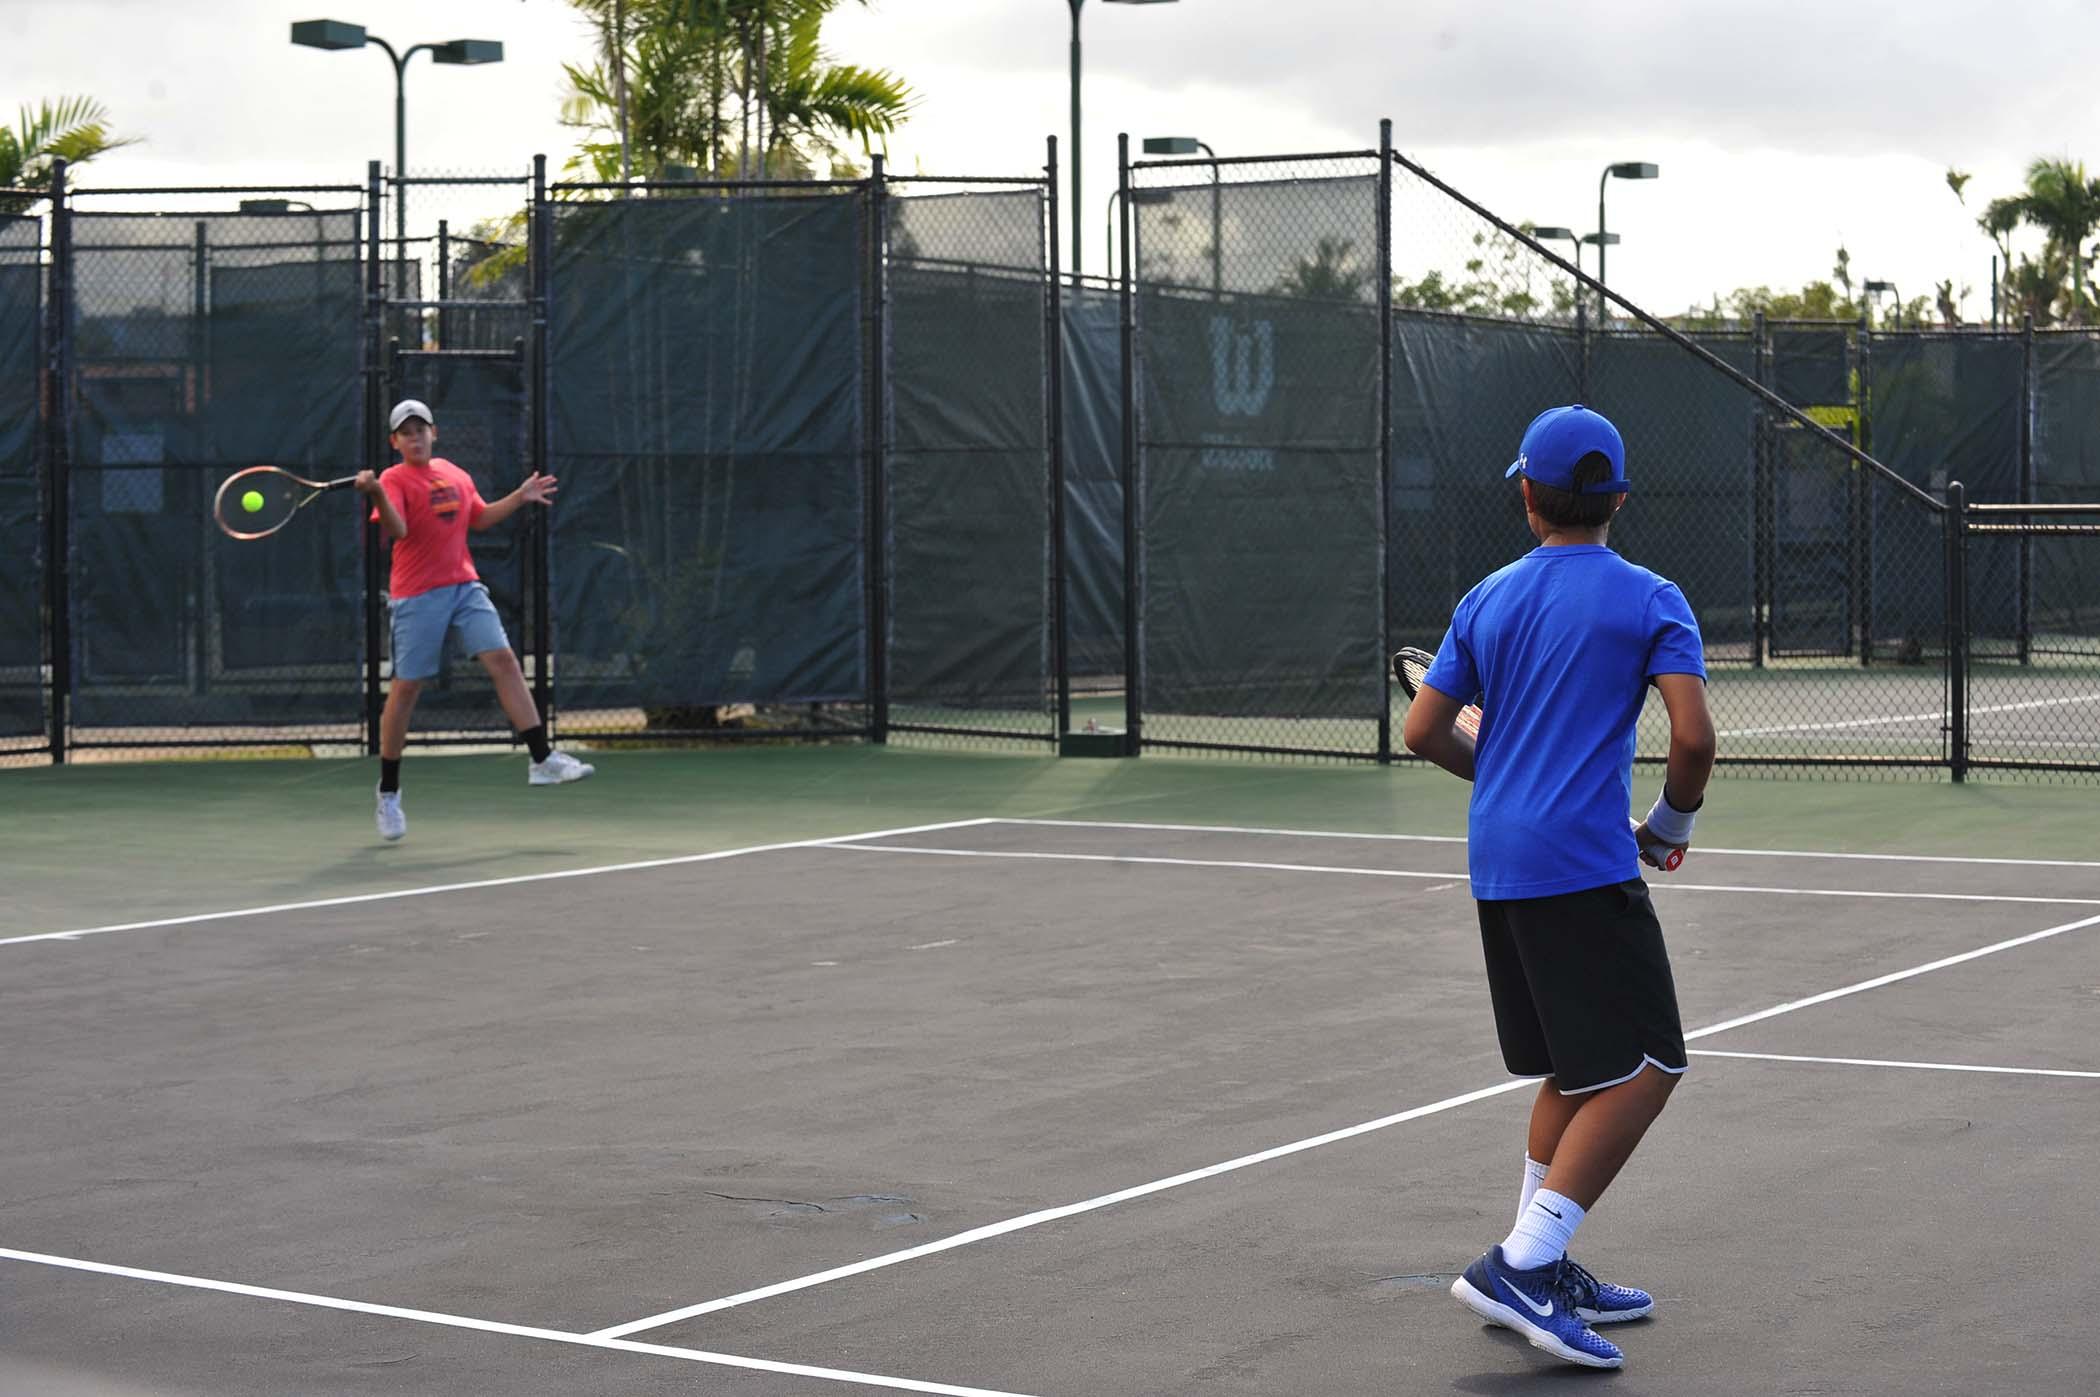 Participantes Tenis Juvenil-2-24-2018-23.jpg